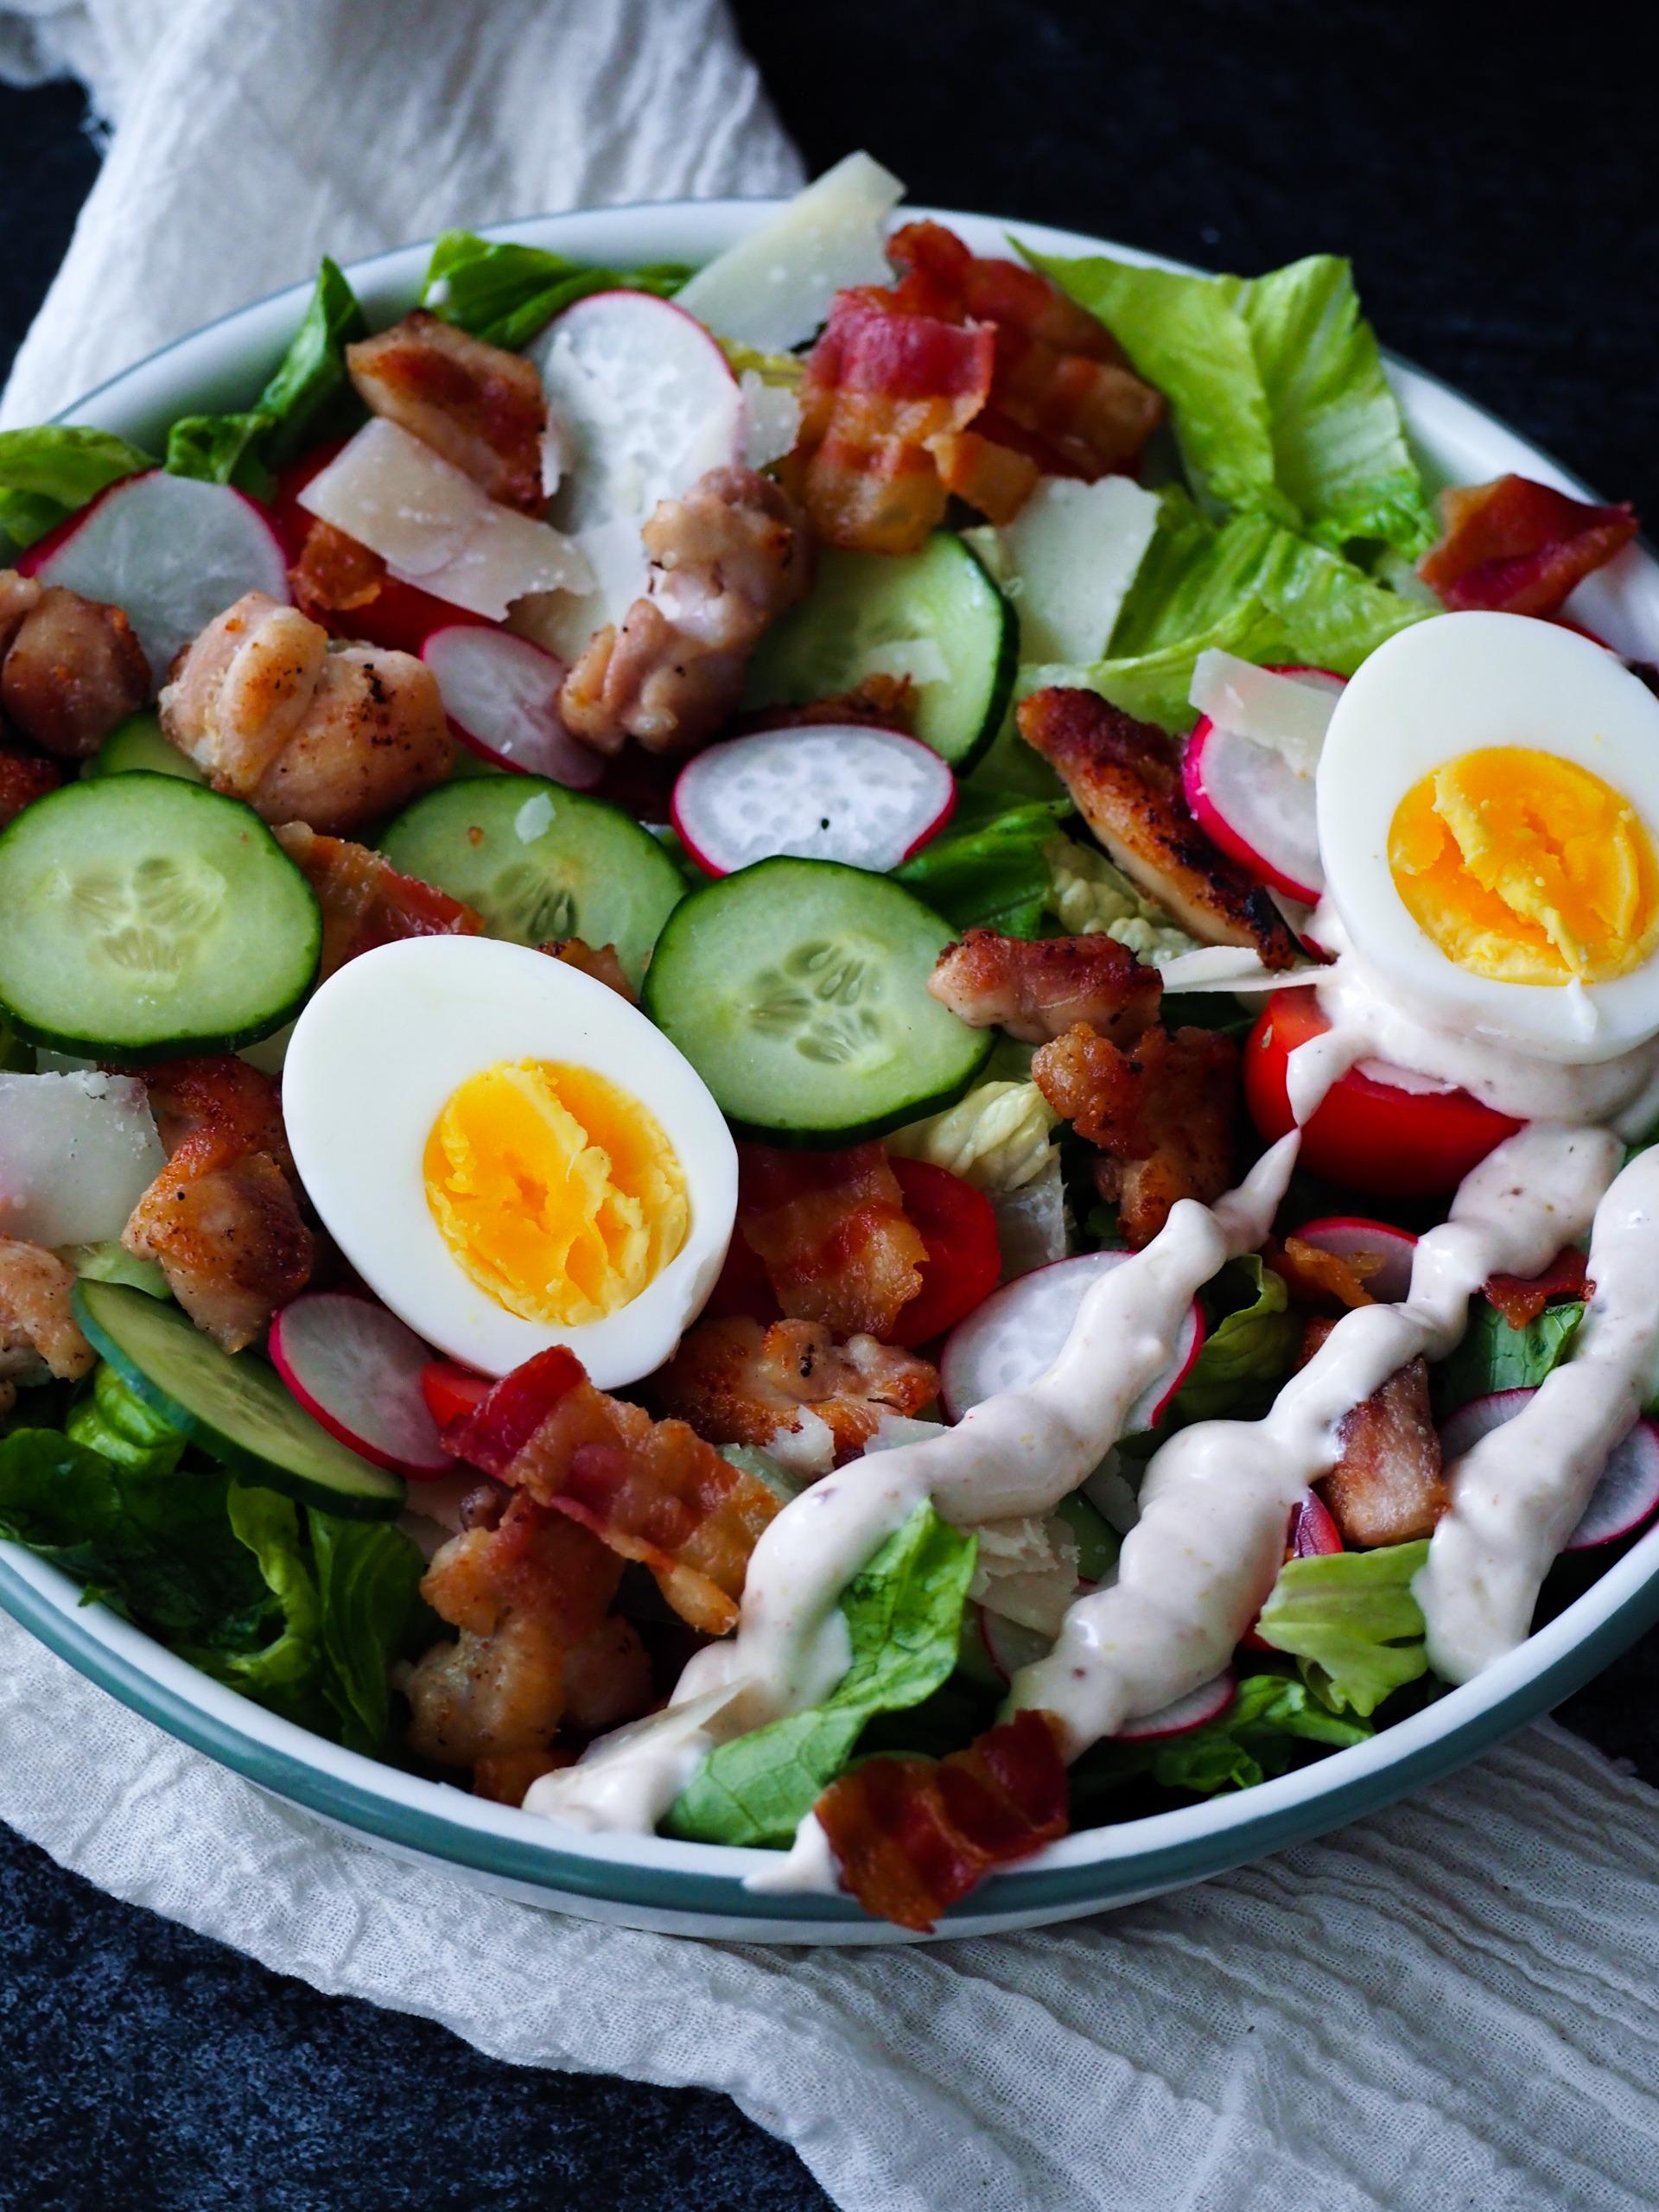 Ceasar salad dressing